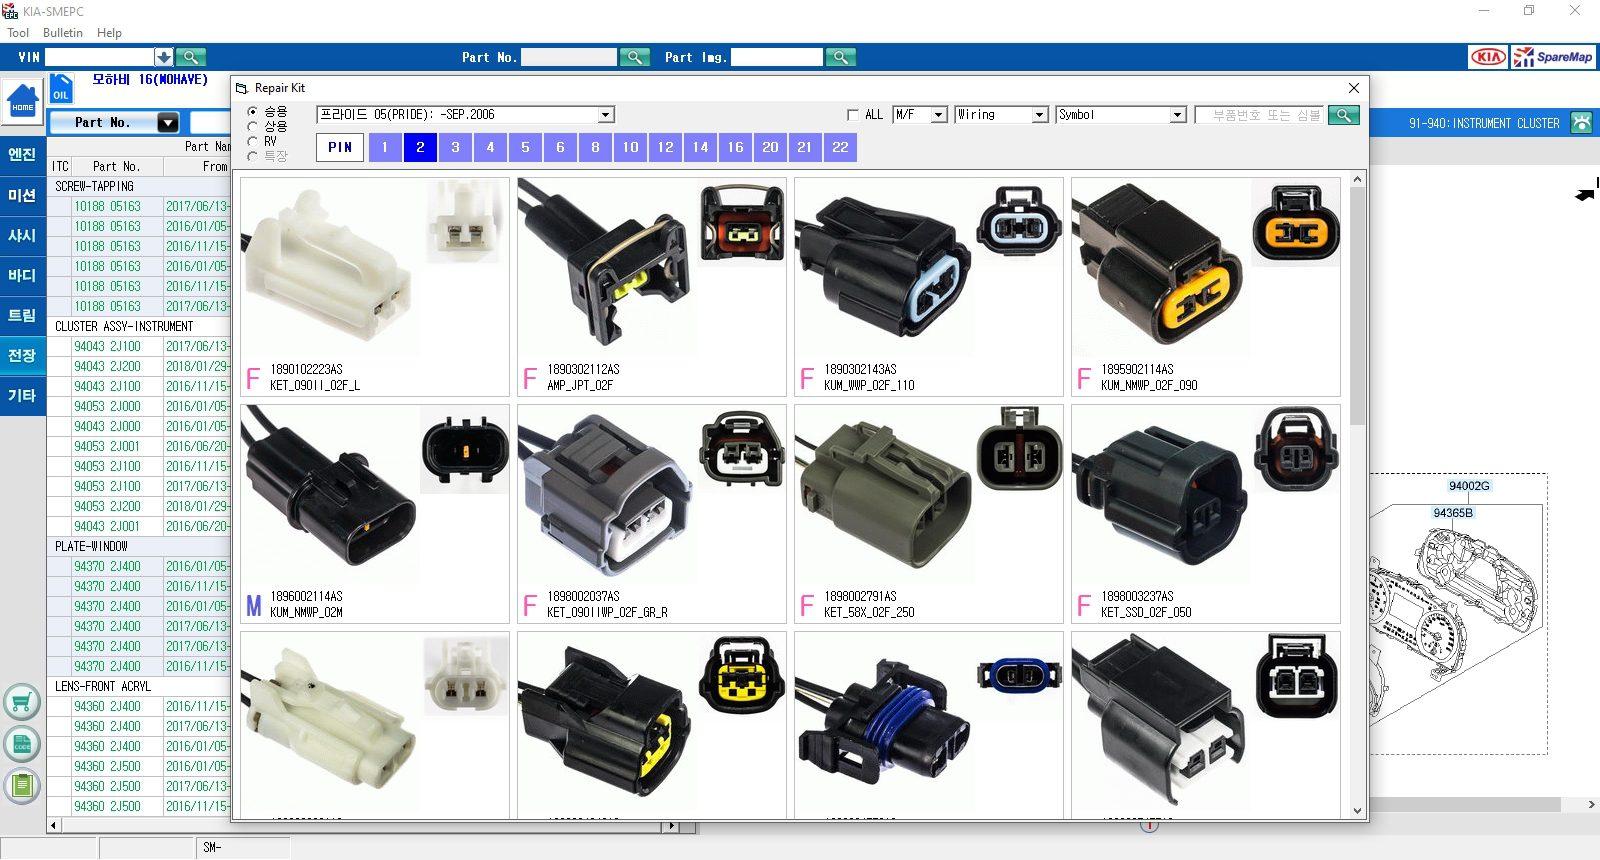 Hyundai_Kia_Korea_SM_EPC_072019_Parts_Catalog_Domestic_Market_9